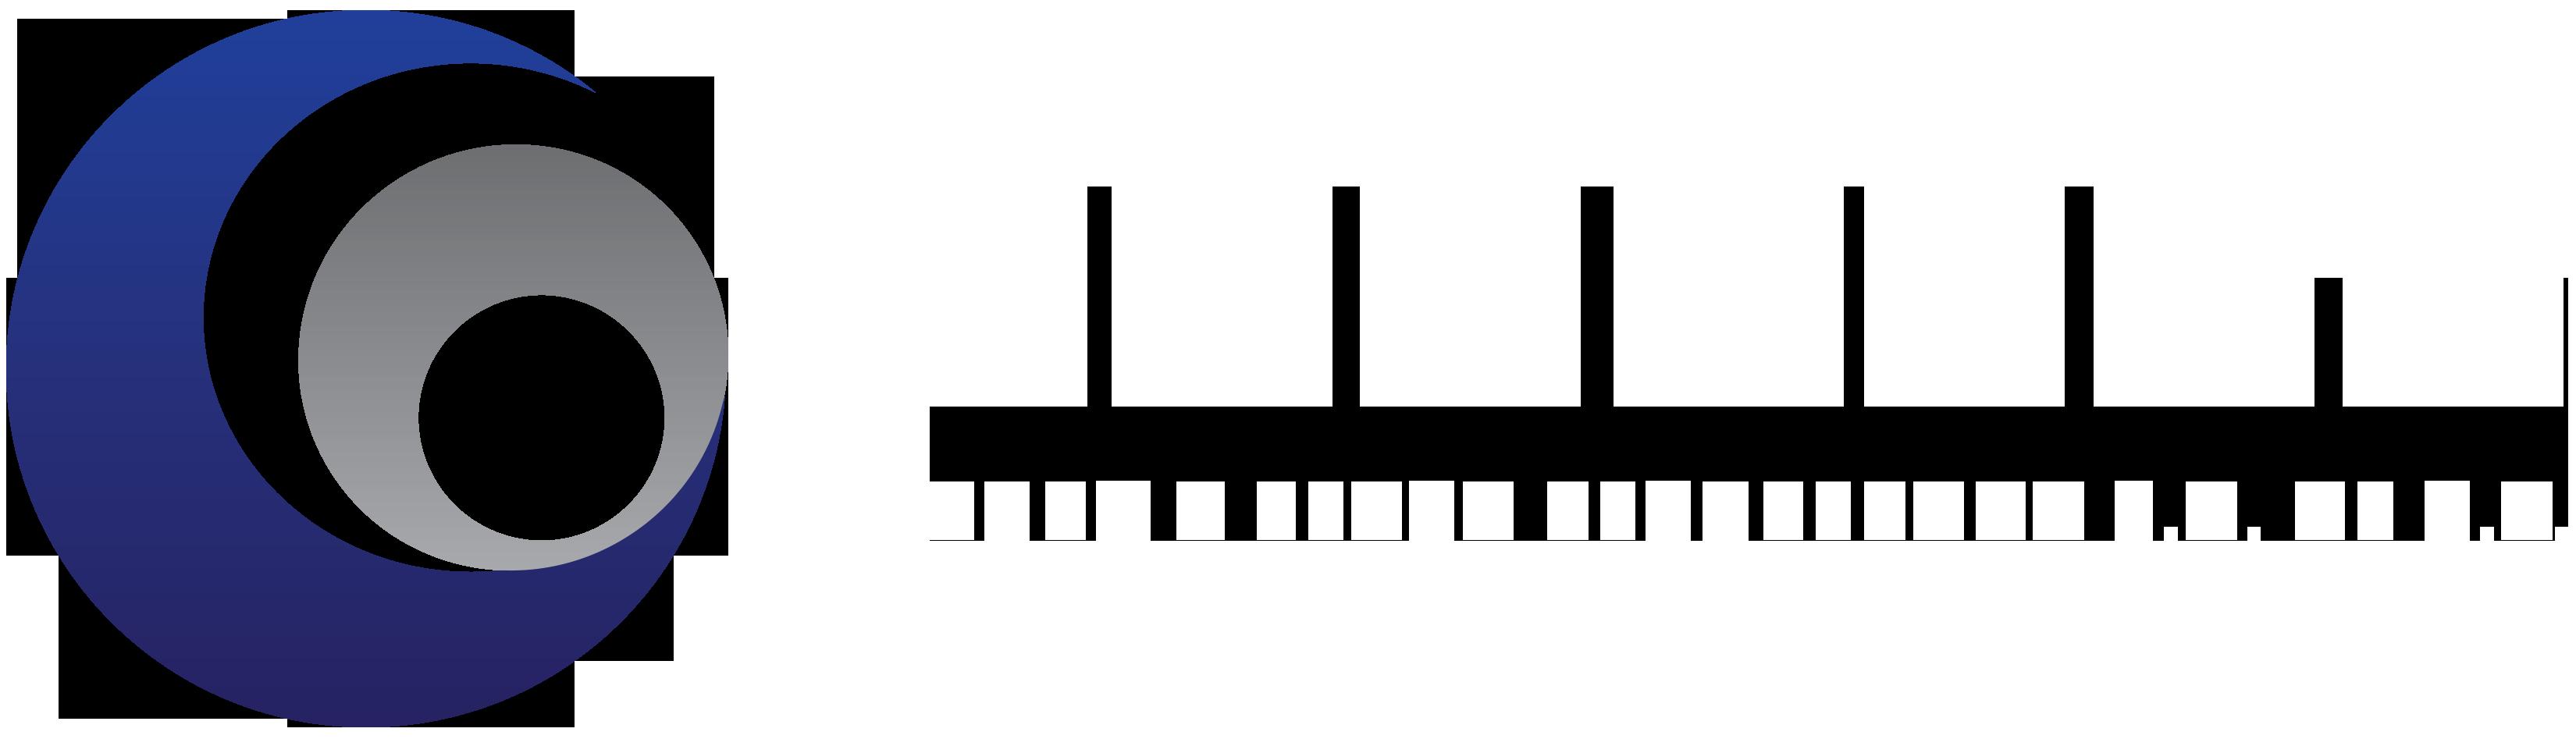 http://www.tuberia.com.mx/wp-content/uploads/2016/09/logo-Tupresa-white.png